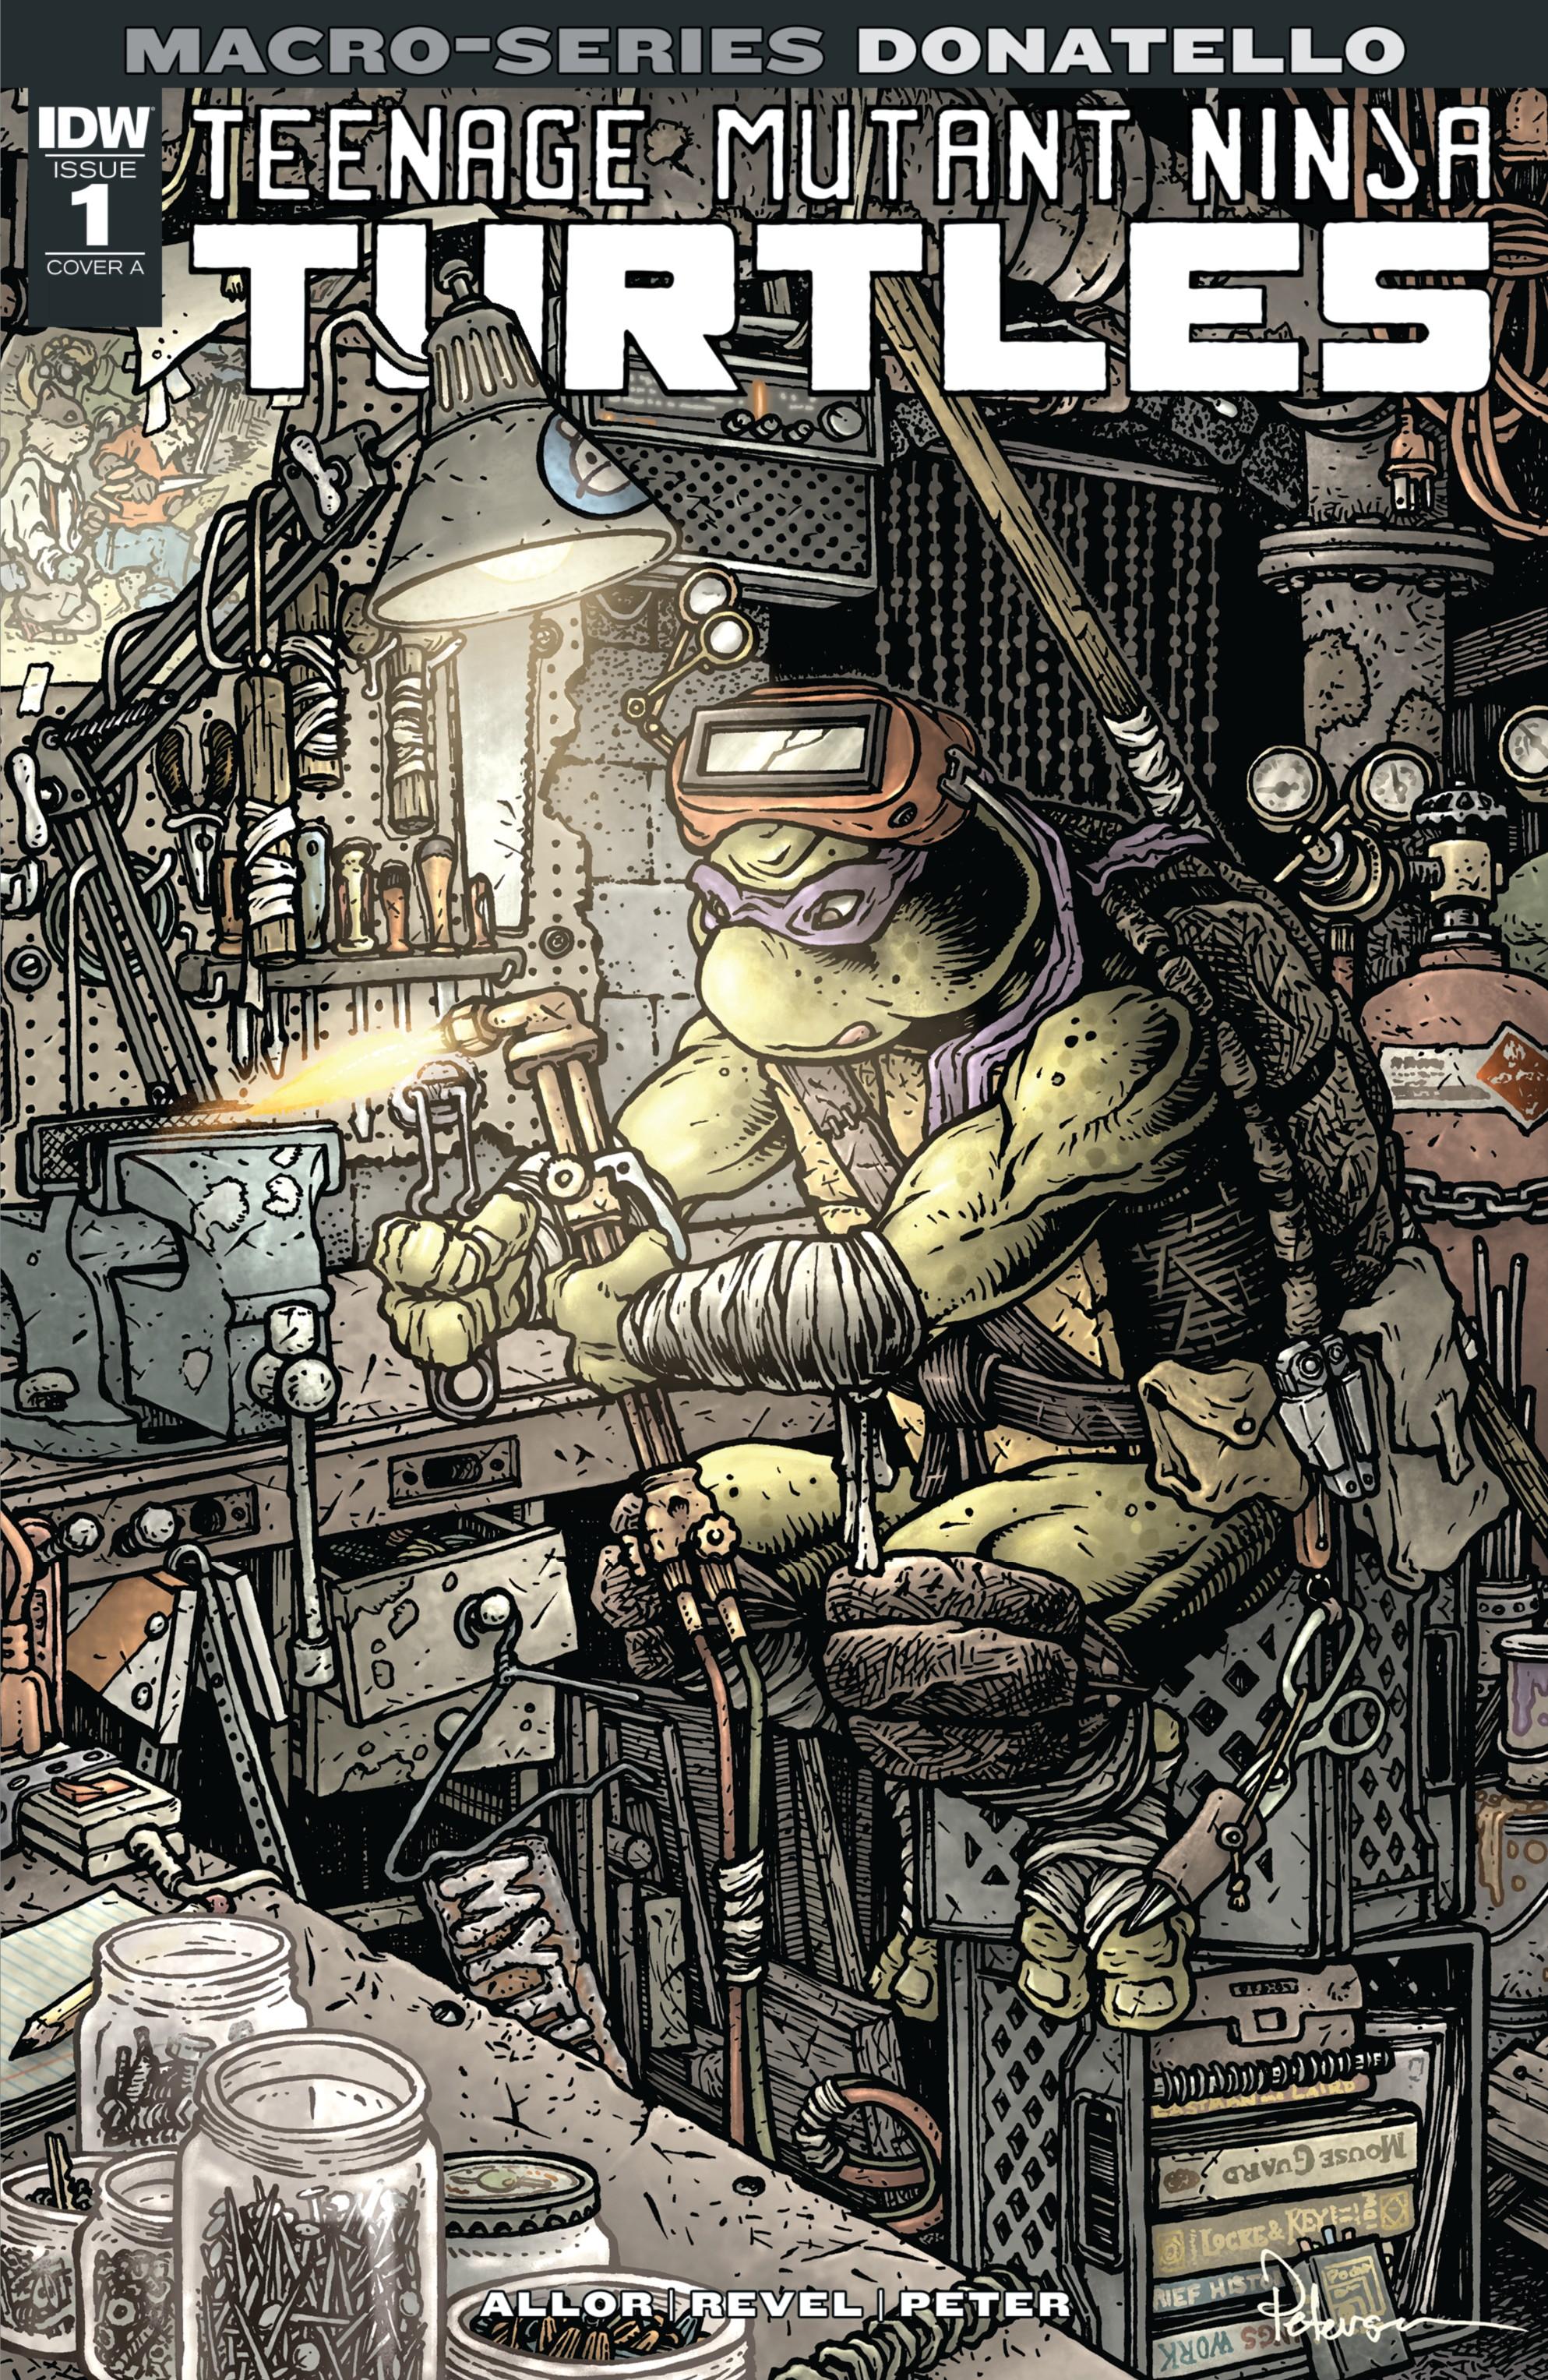 Donatello (IDW Macro-Series issue)